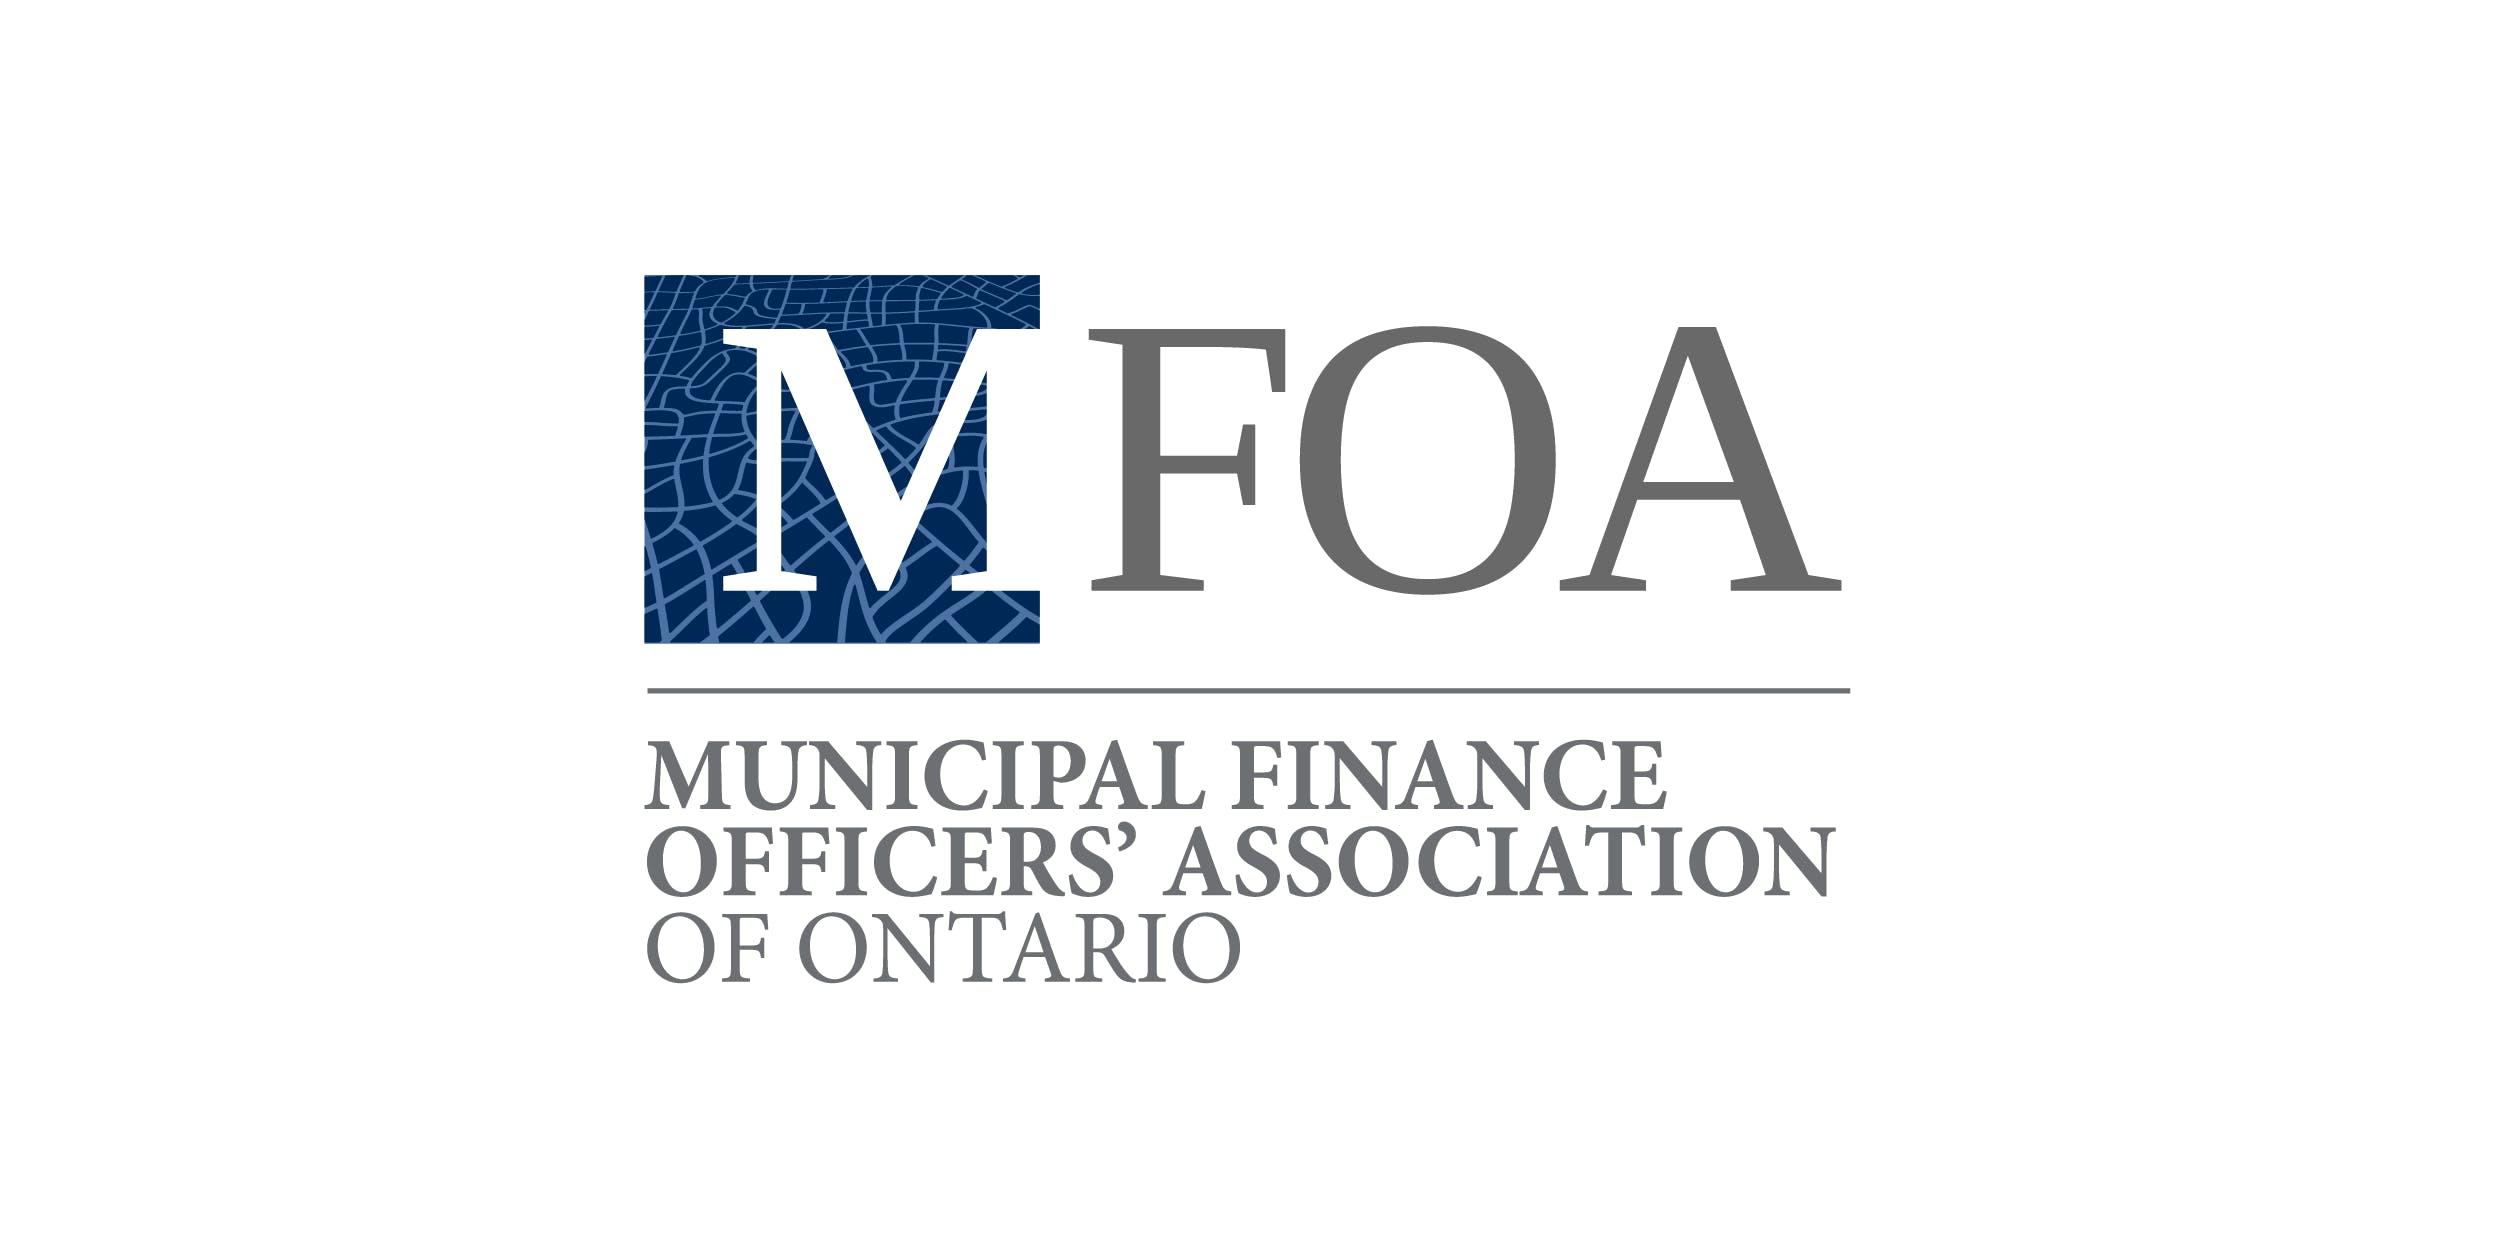 MFOA of Ontario